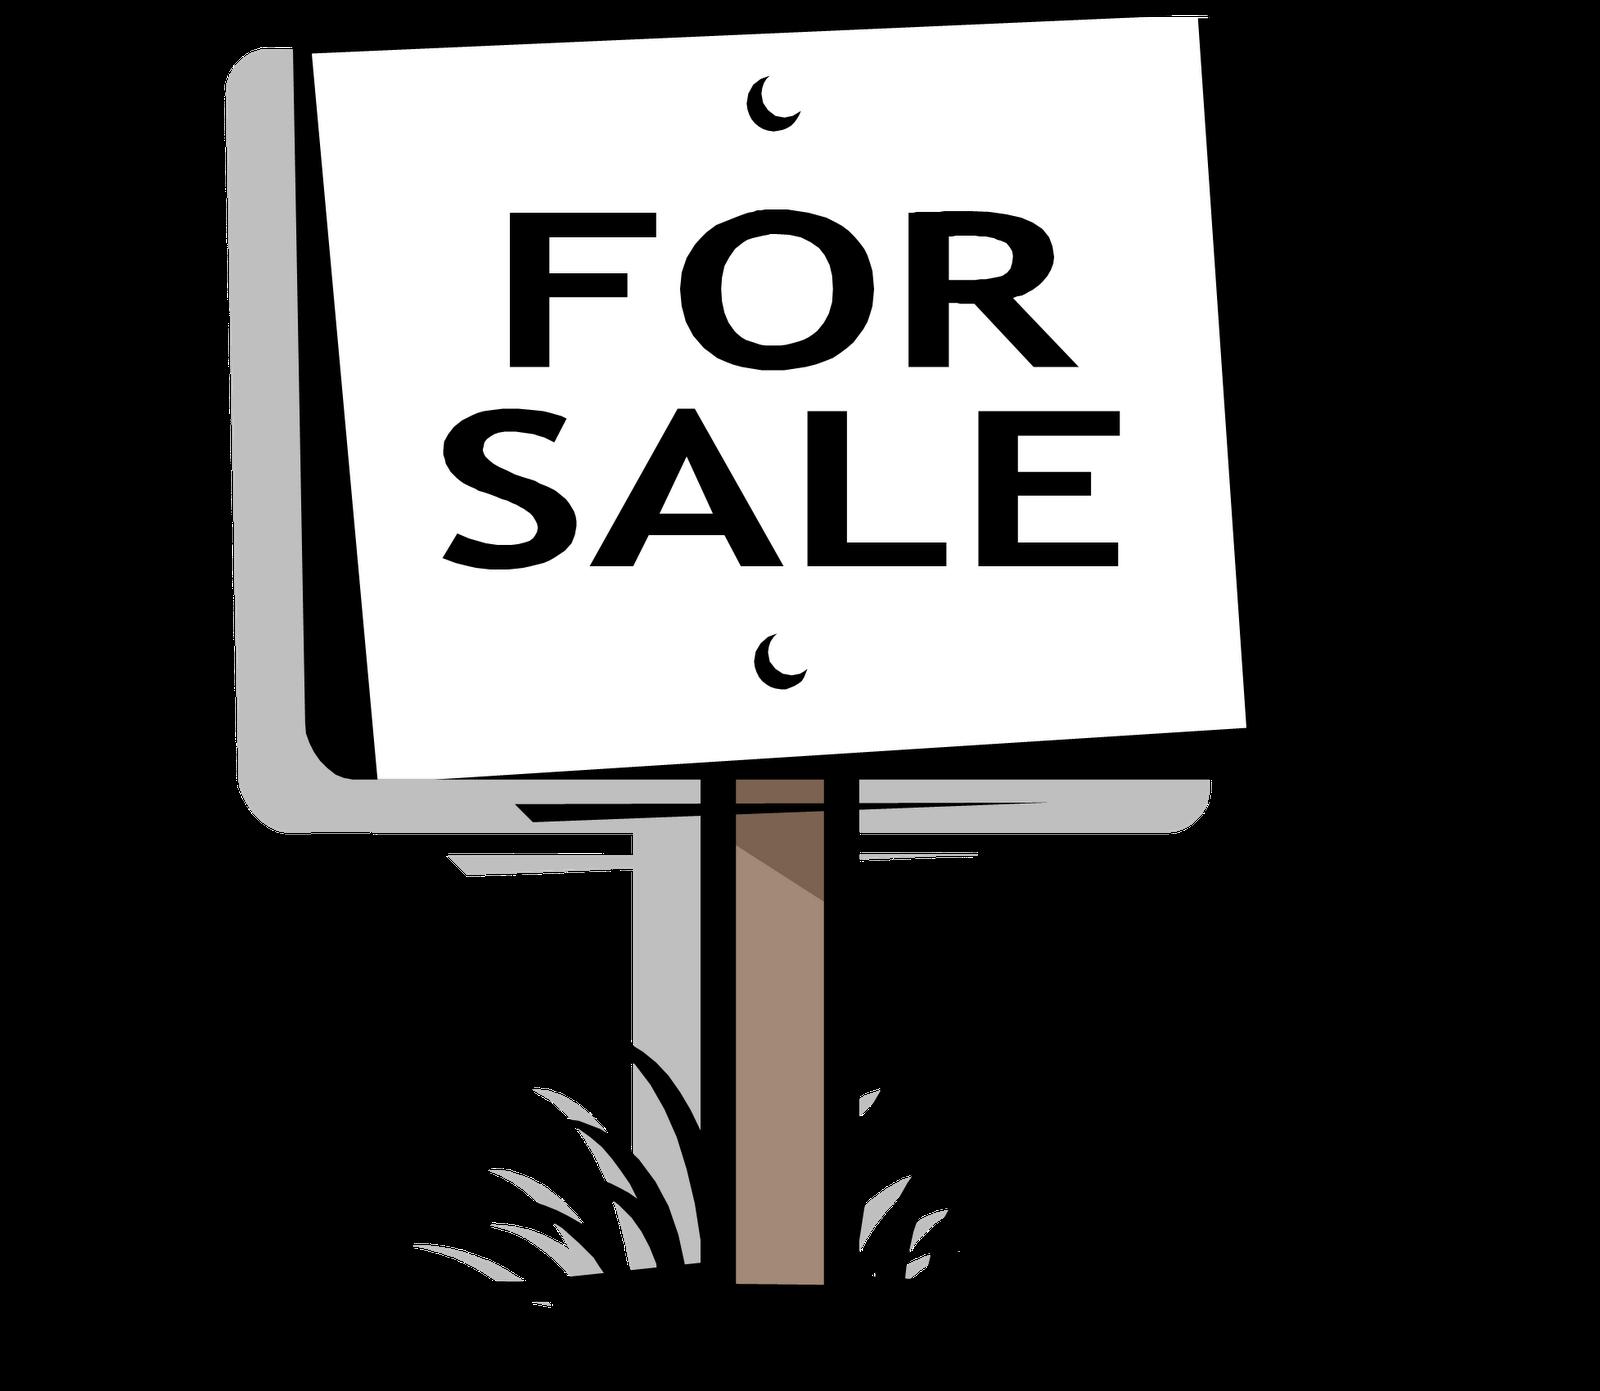 Clipart church yard sale. Garage desktop backgrounds for